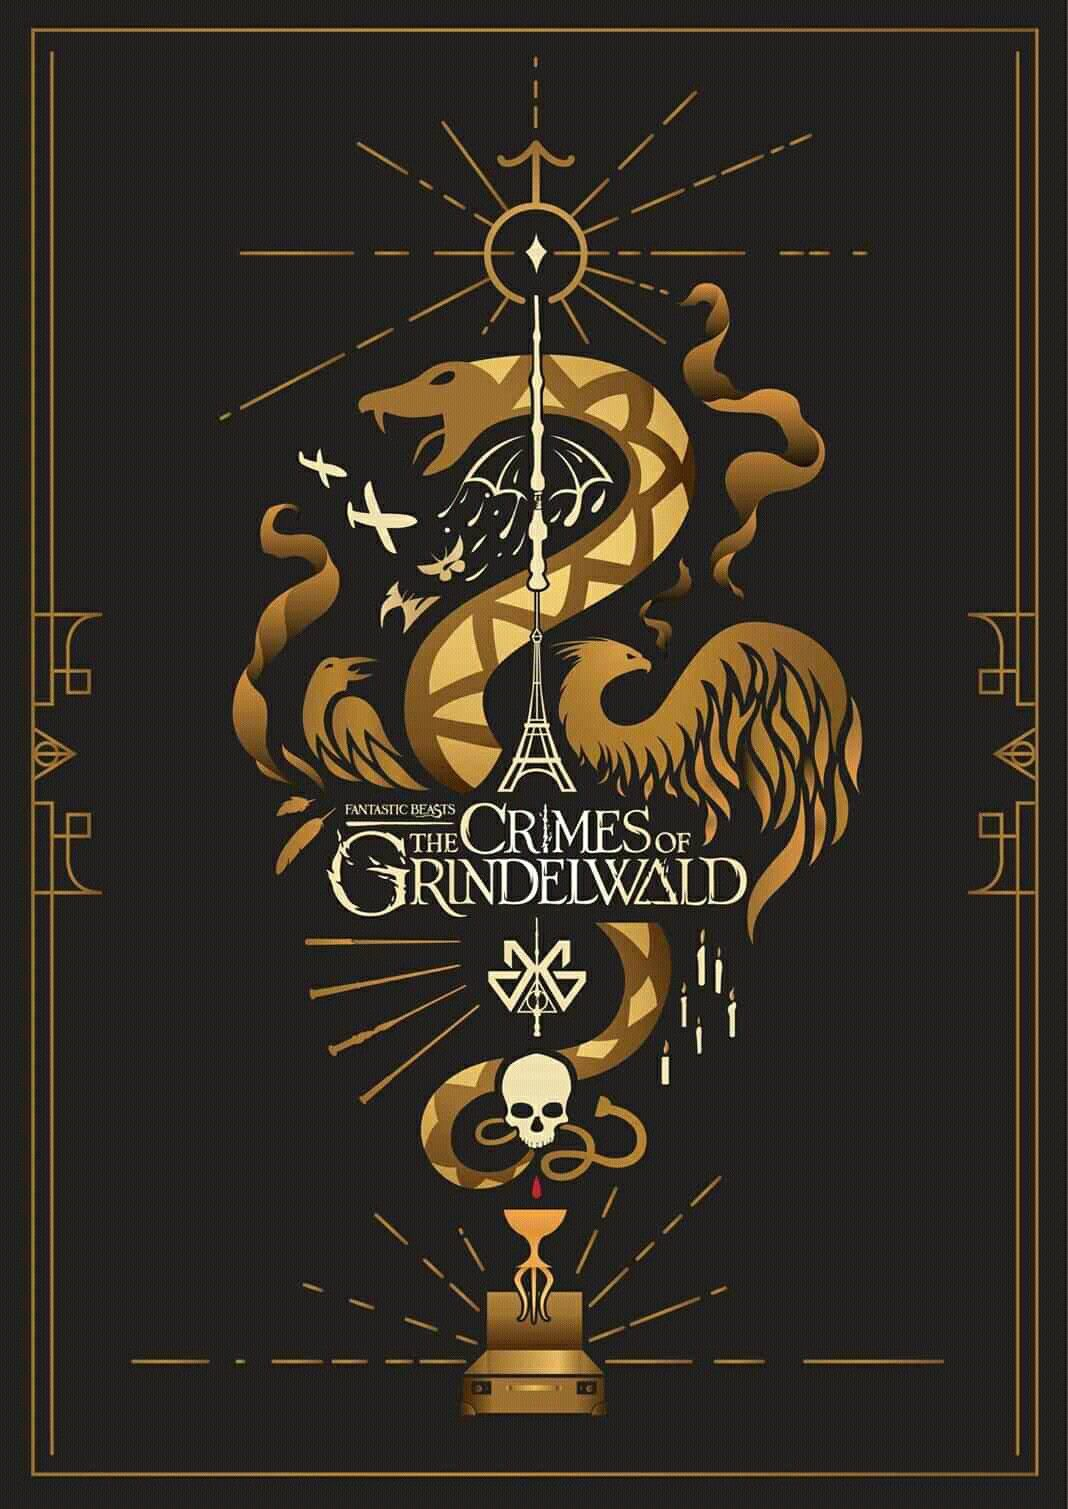 Pin De Julio Cesar Em Harry Potter Bestas Fantasticas Filme